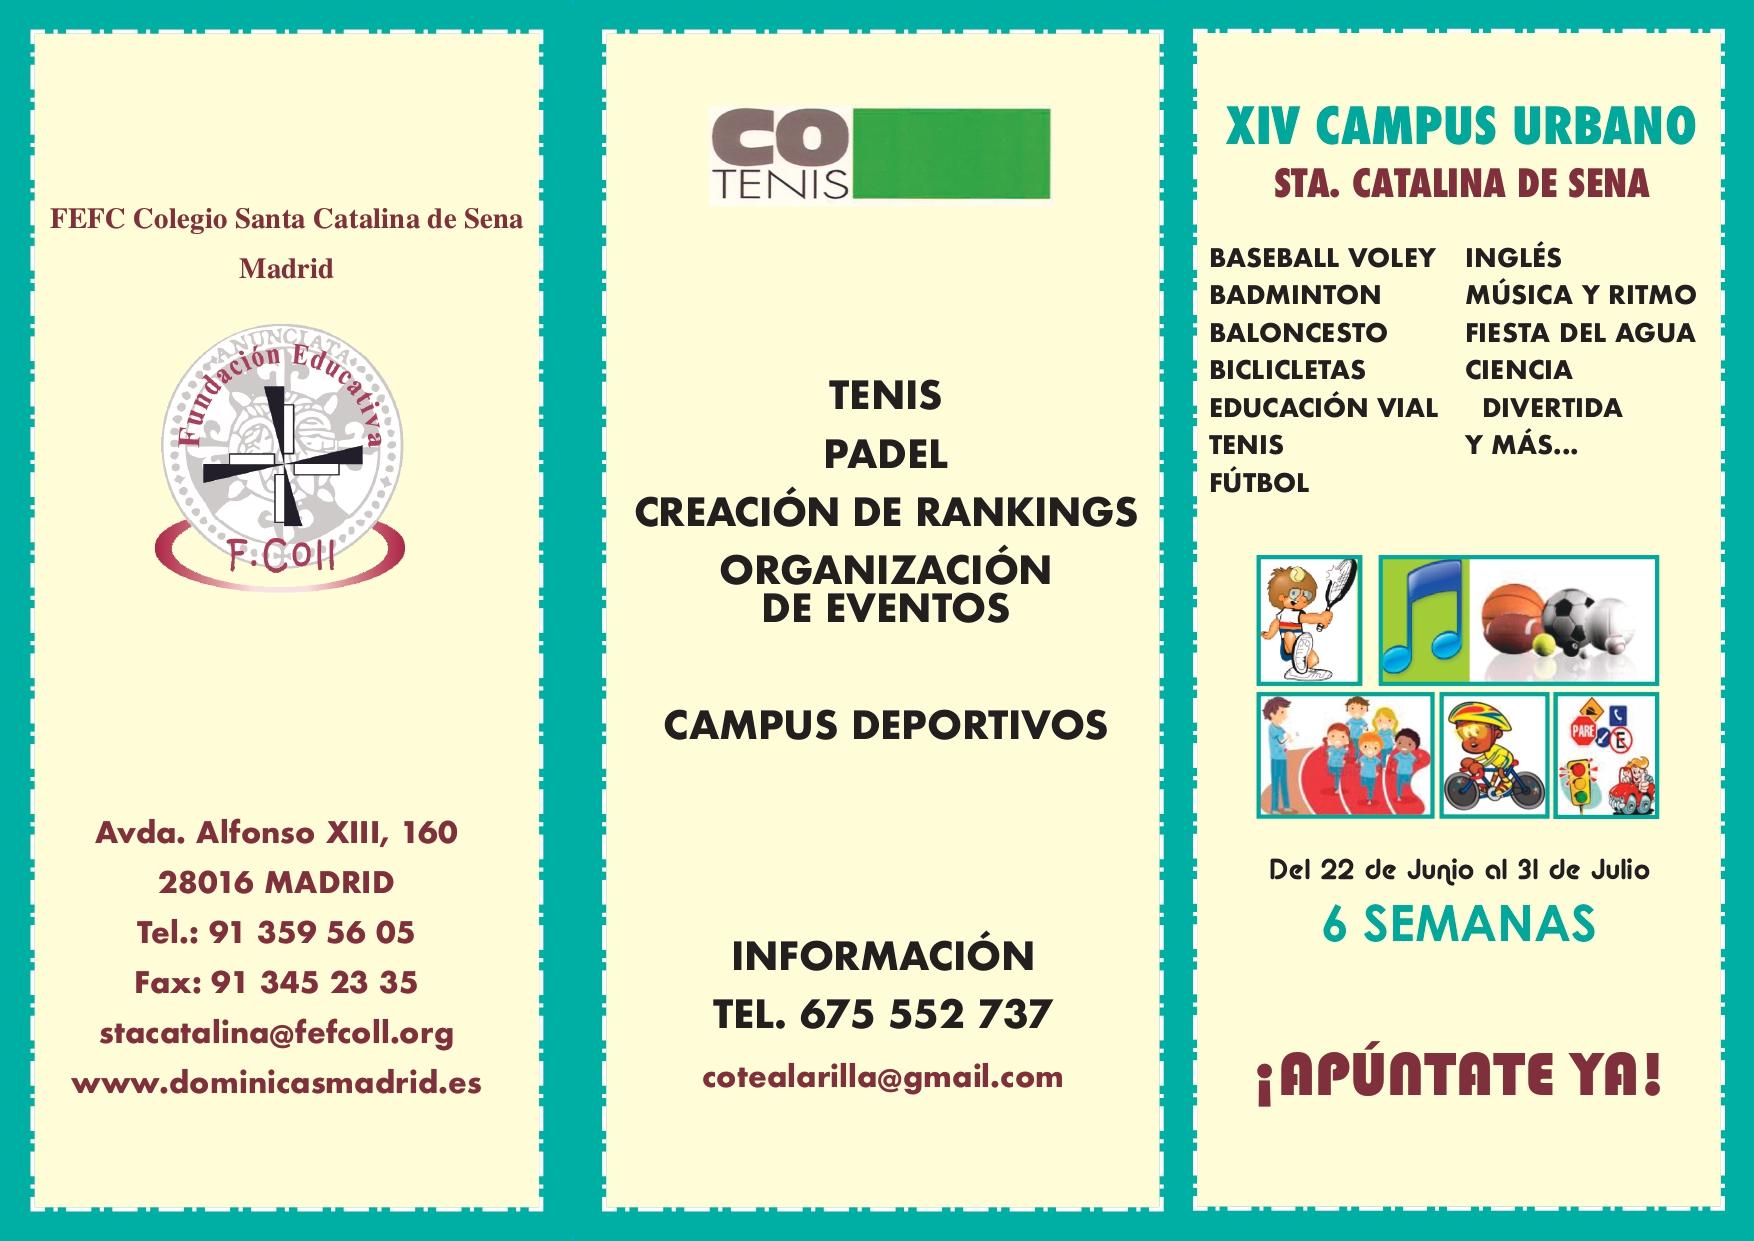 TRIPTICO-COTENIS-2020_page-0001-1